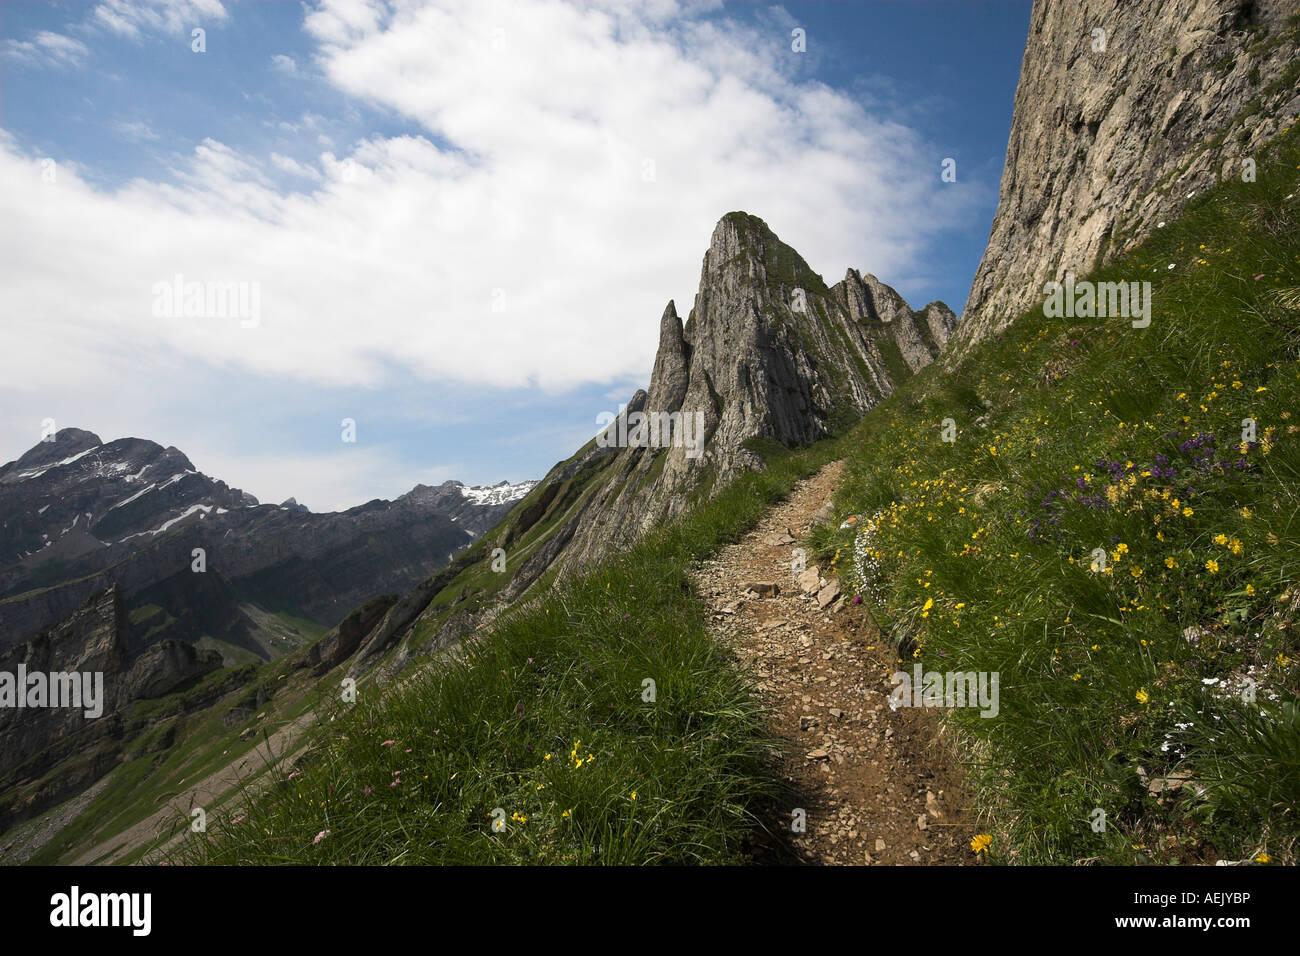 Berg-Weg im Alpsteingebirge Kanton Appenzell, Schweiz Stockbild